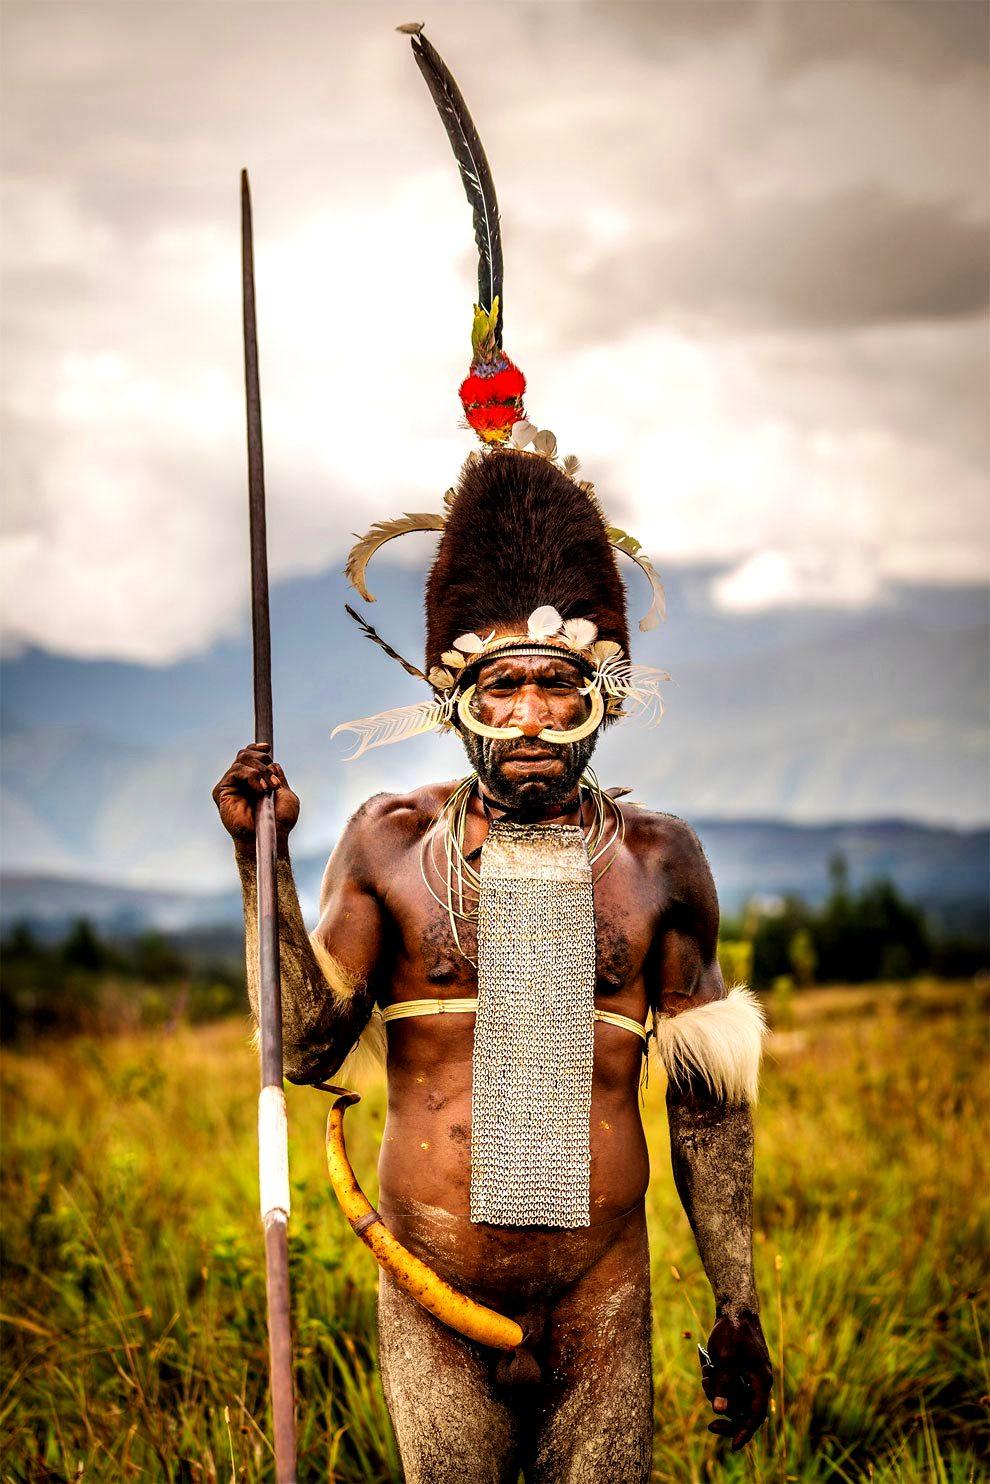 воин племени дани в шапке